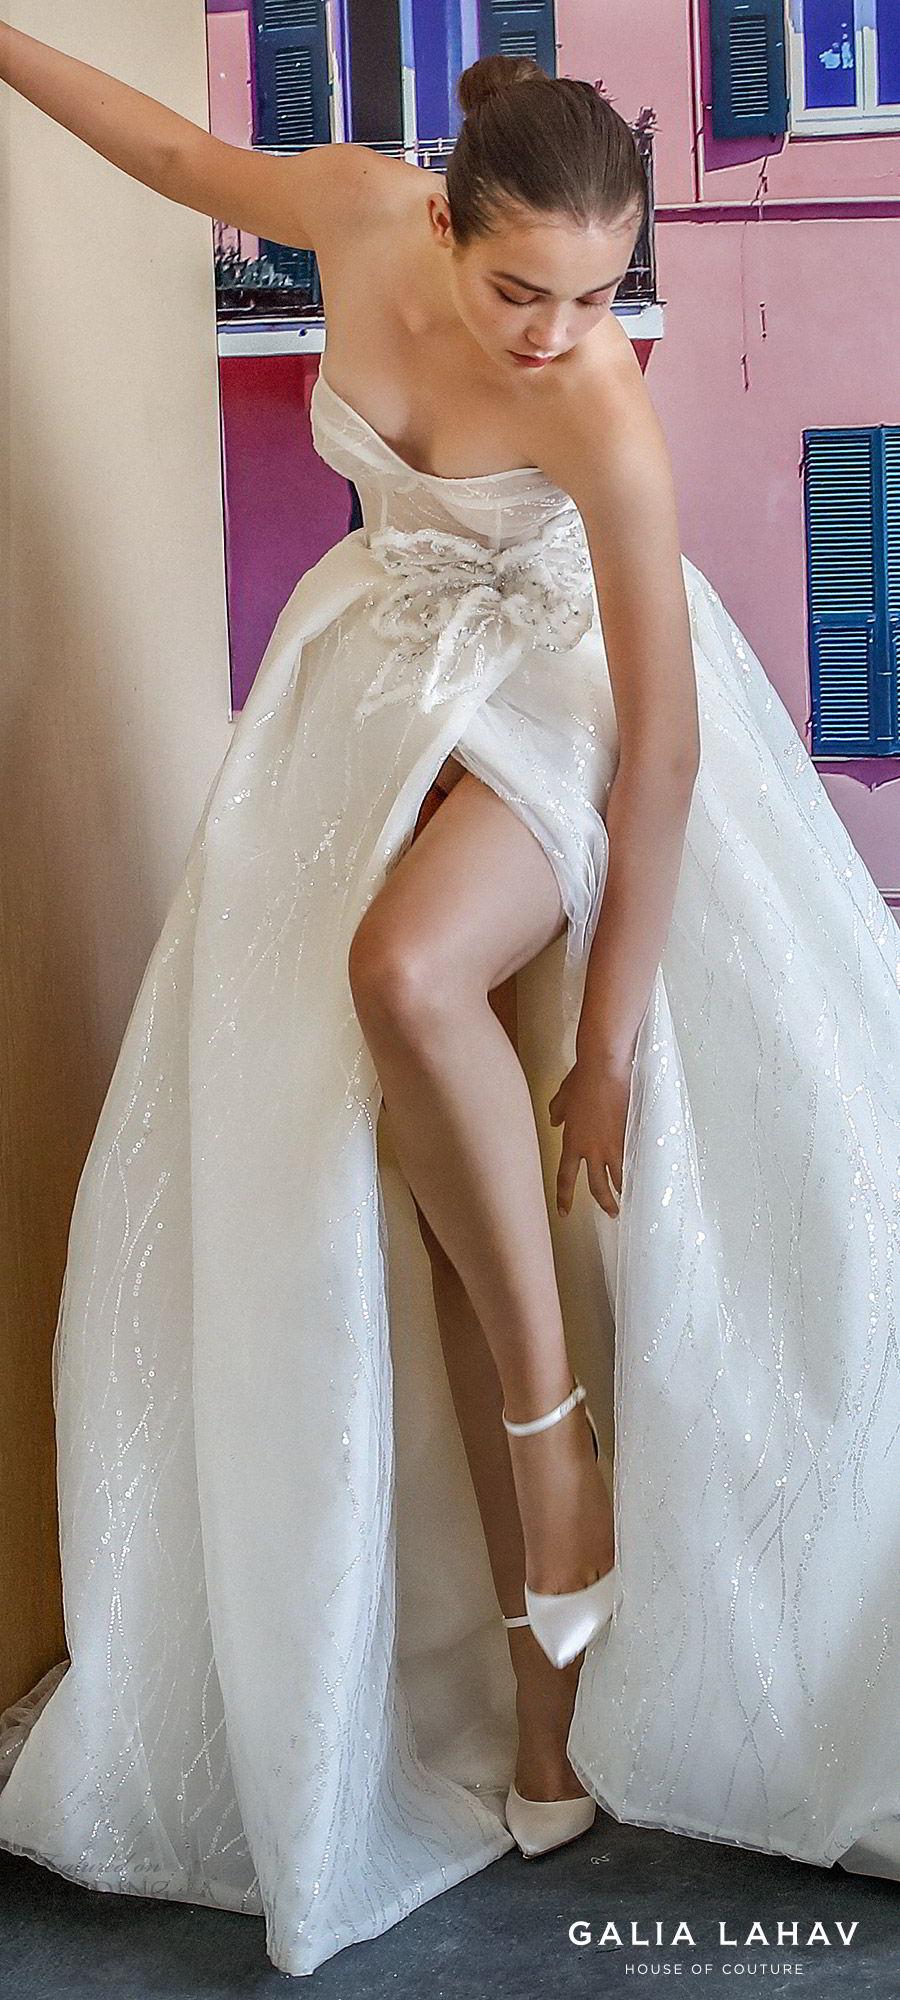 galia lahav fall 2019 bridal strapless sweetheart glitzy ball gown wedding dress slit skirt romantic sweep train (magdalena) zv